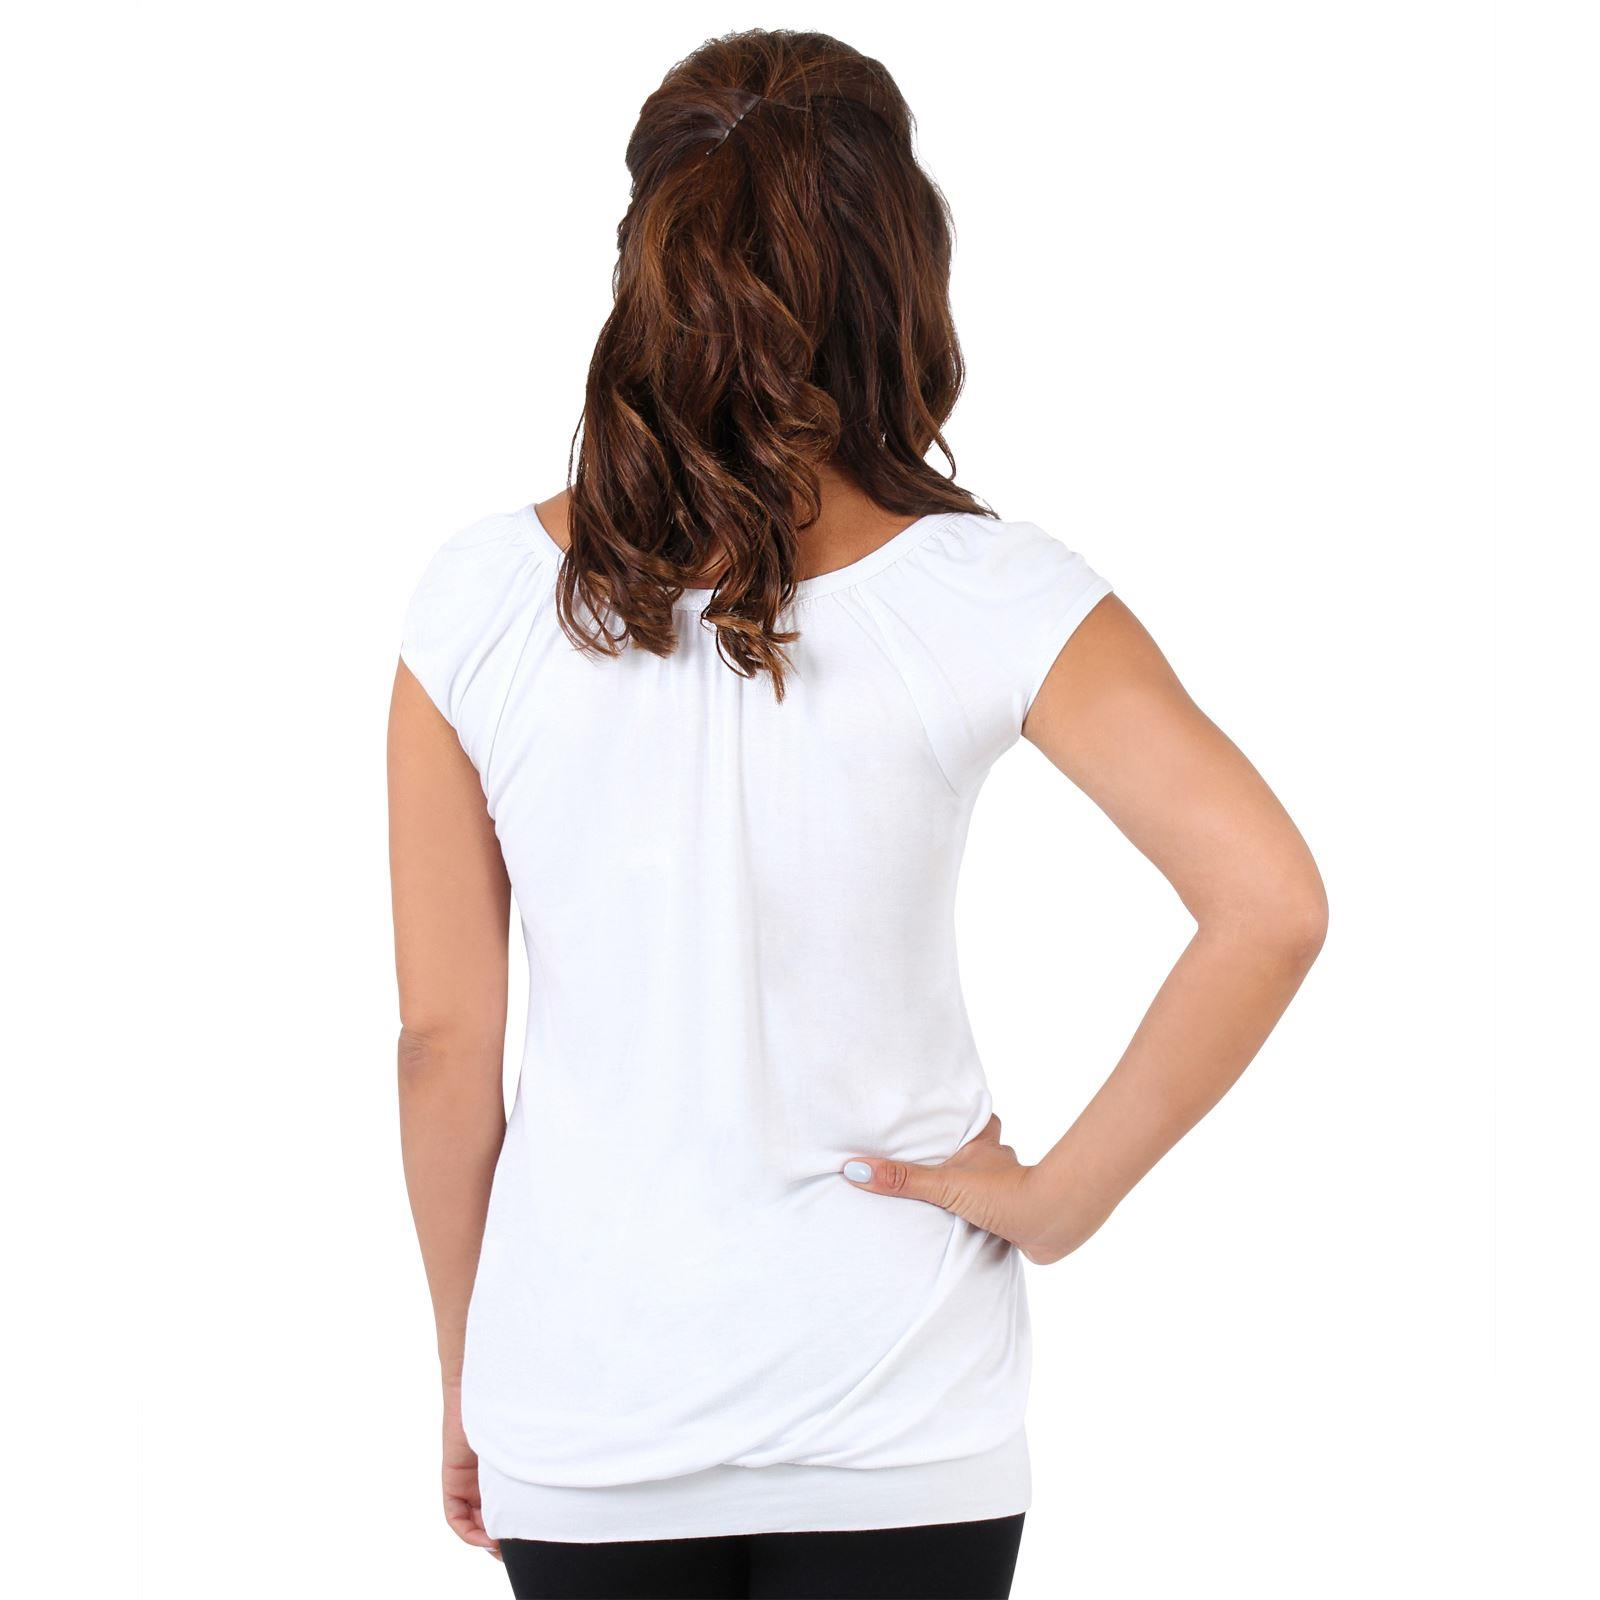 Womens-Ladies-Plain-T-Shirt-Short-Sleeve-Long-Loose-V-Neck-Blouse-Tunic-Top thumbnail 62